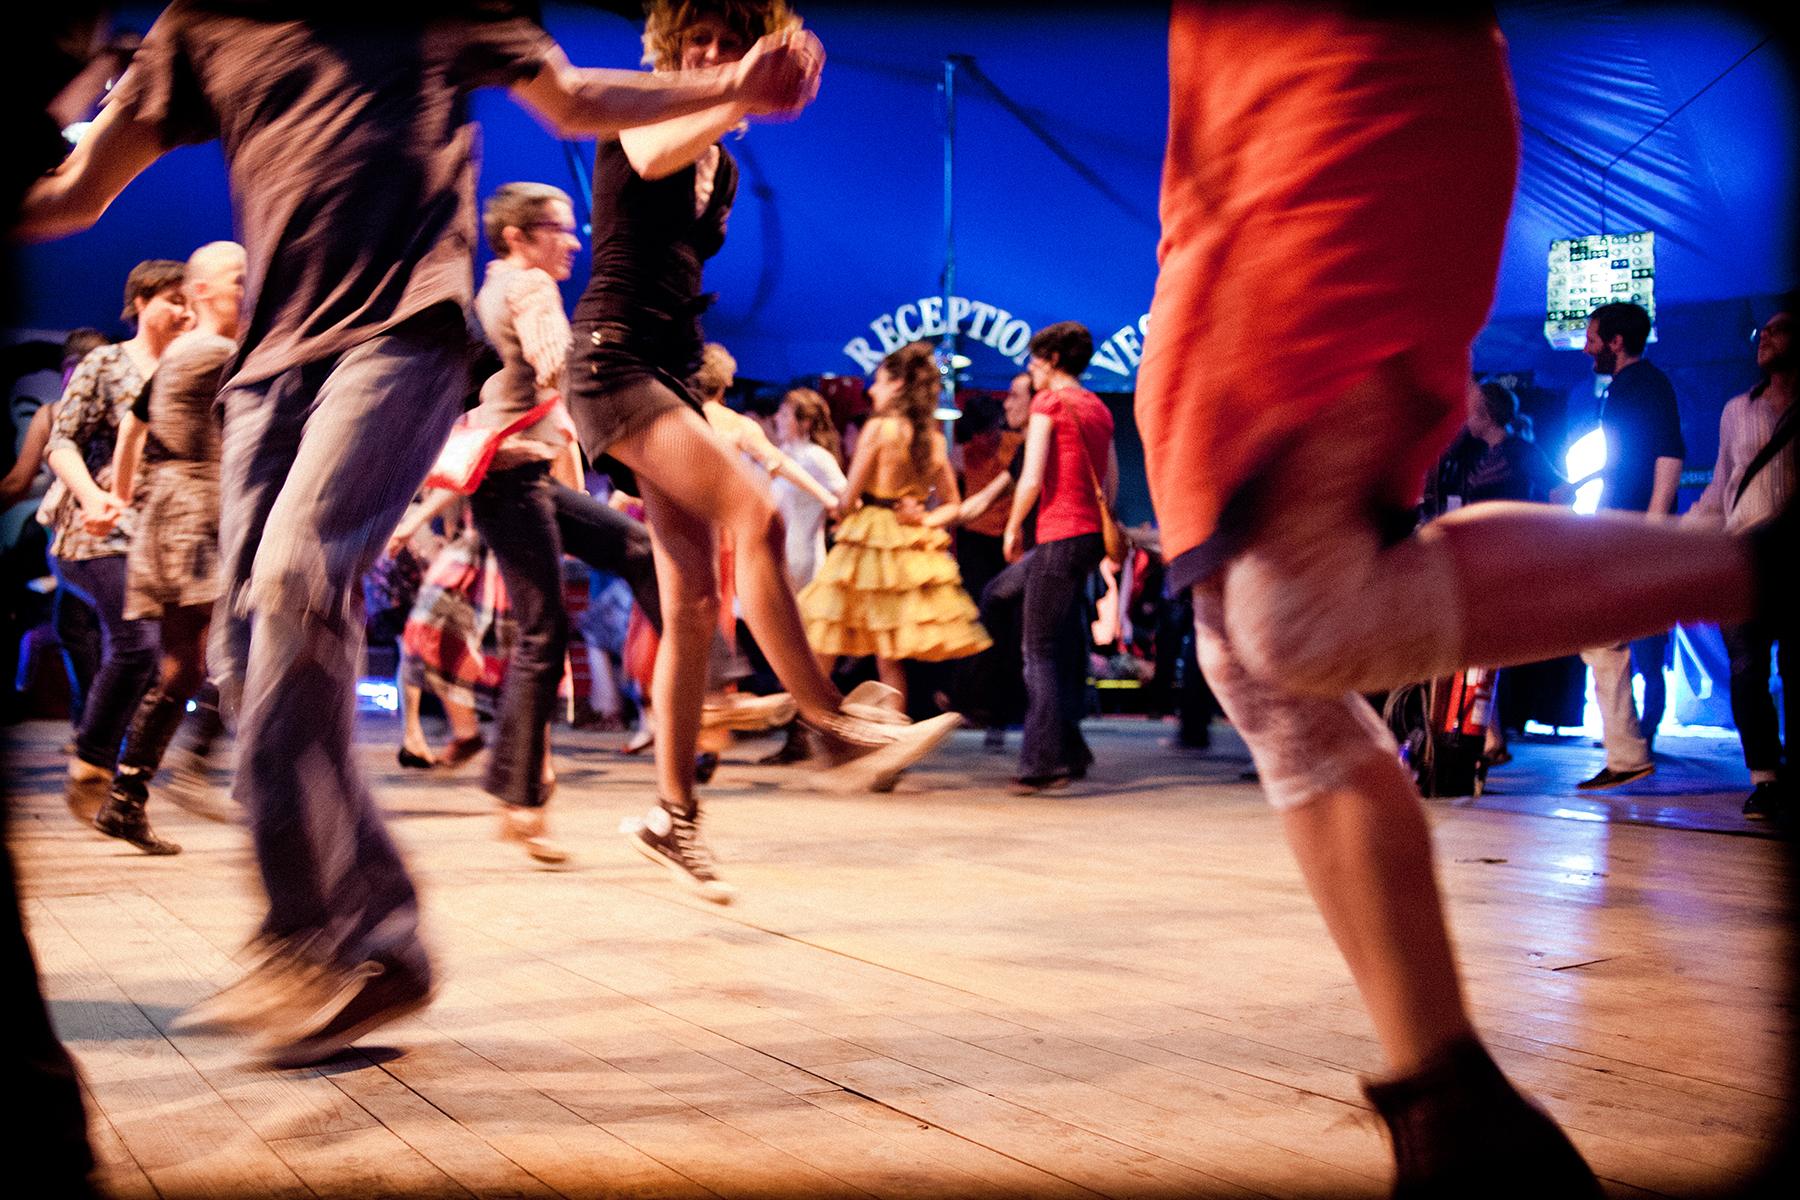 La piste à dansoire © Damien Bossis